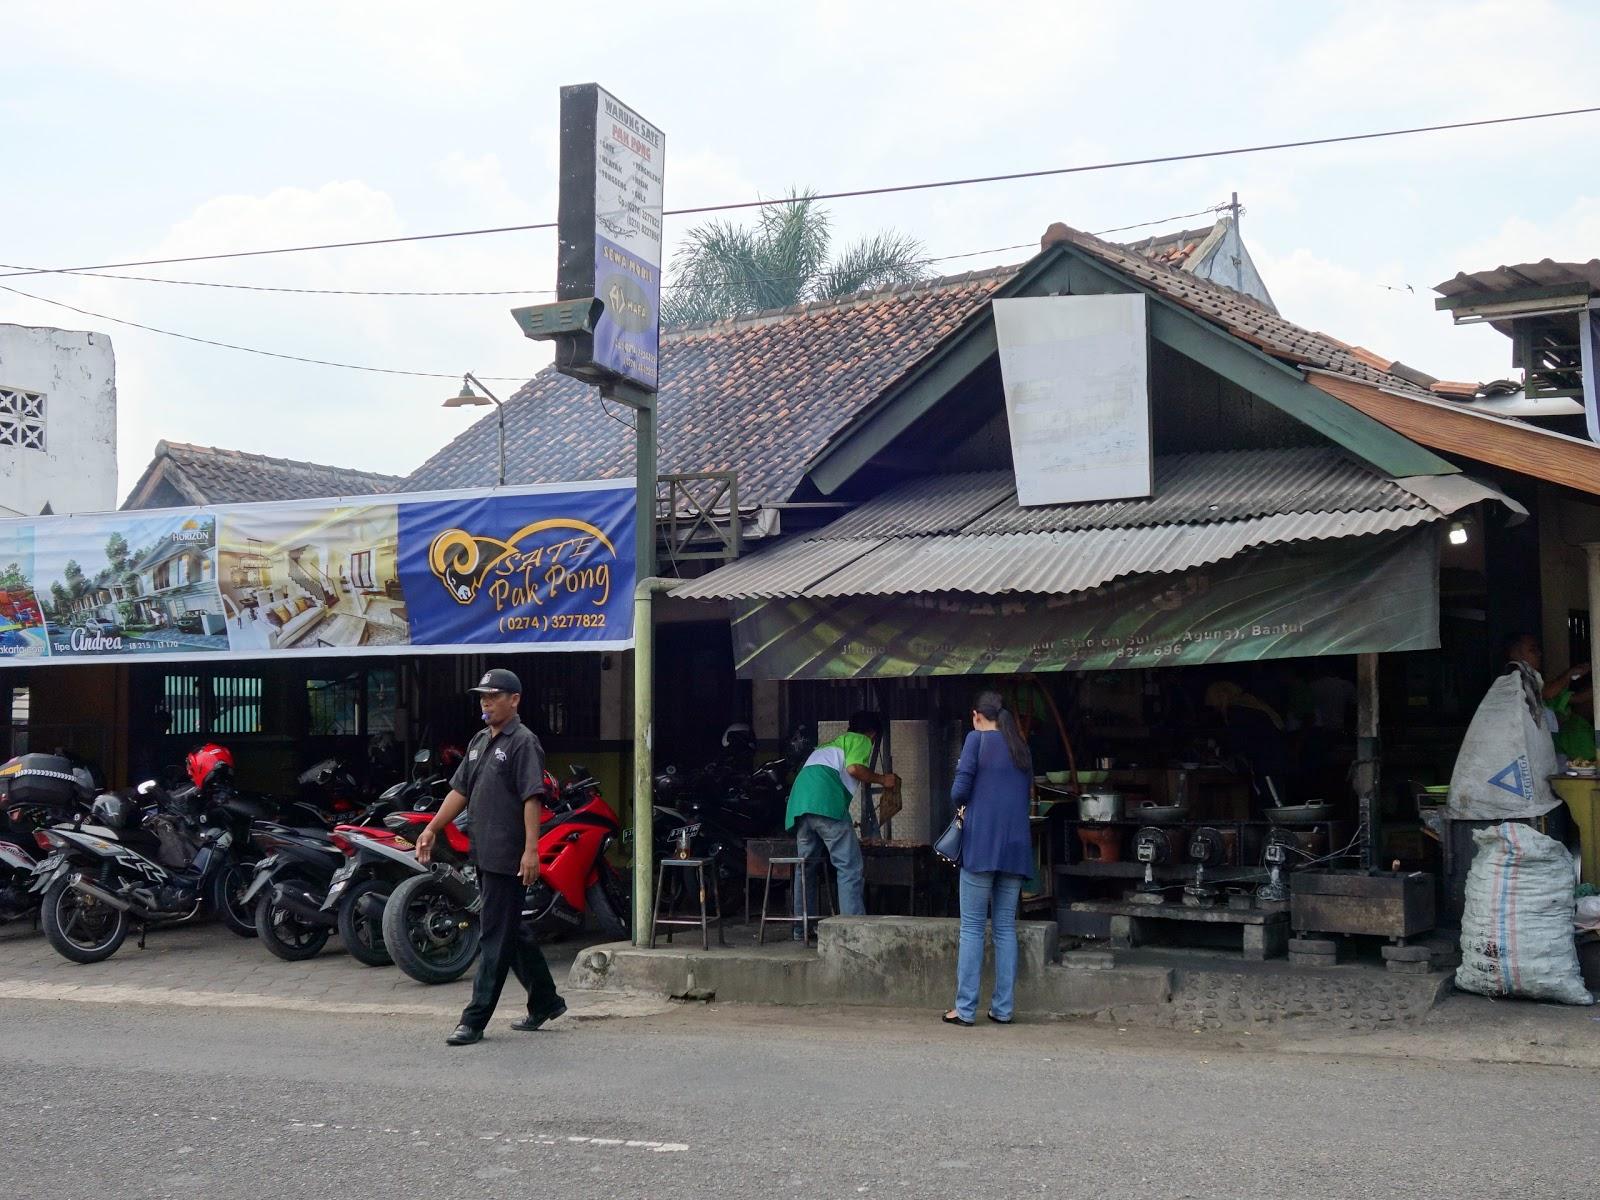 tesyasblog : Jogjakarta's Culinary: Sate Klathak Pak Pong